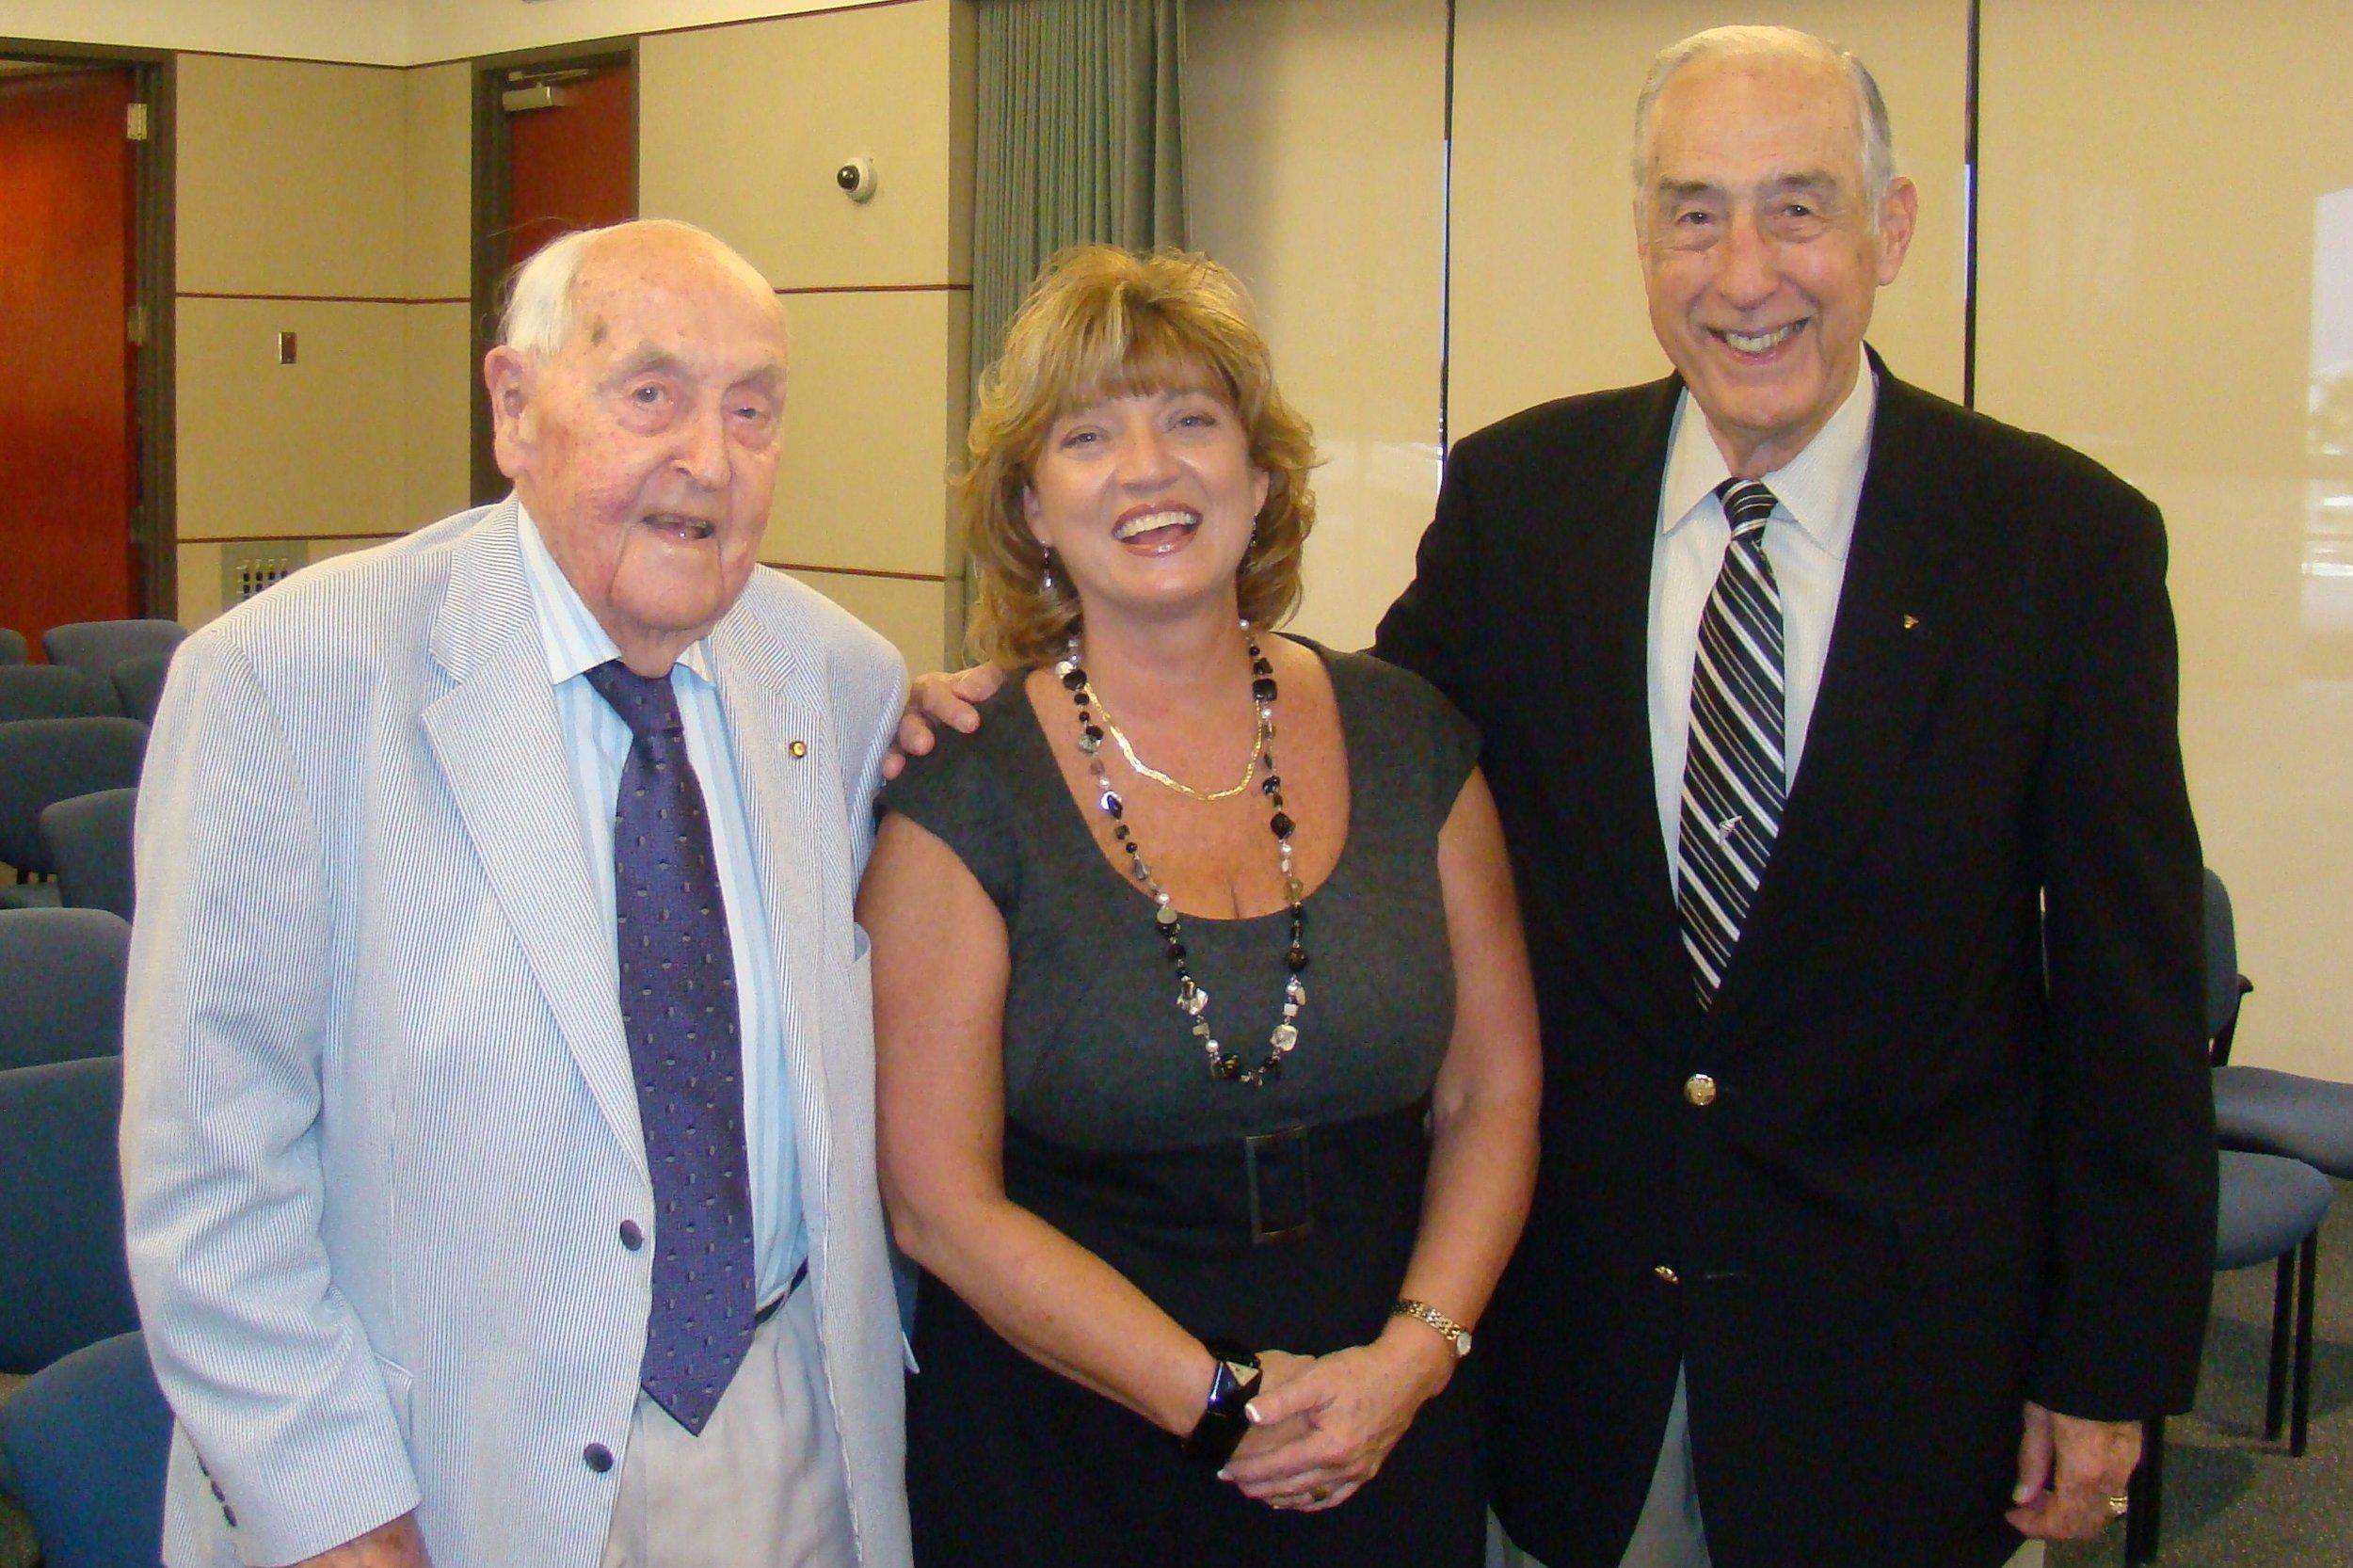 Sir Lenox, Colleen Picard & Dick Newton - 1, 27 Oct '11 - Copy (2).JPG